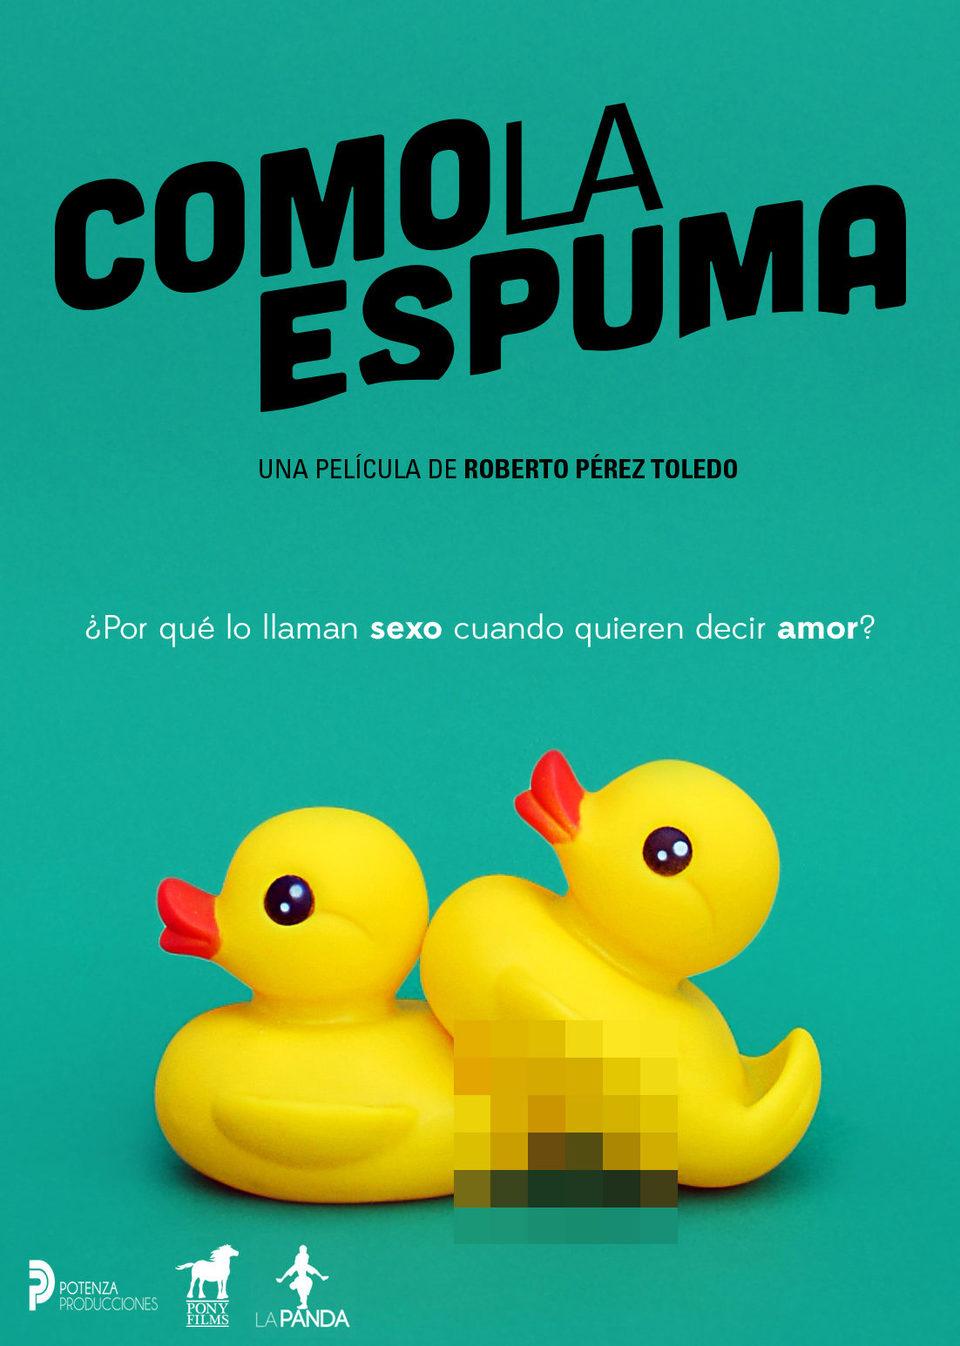 España poster for Como la espuma